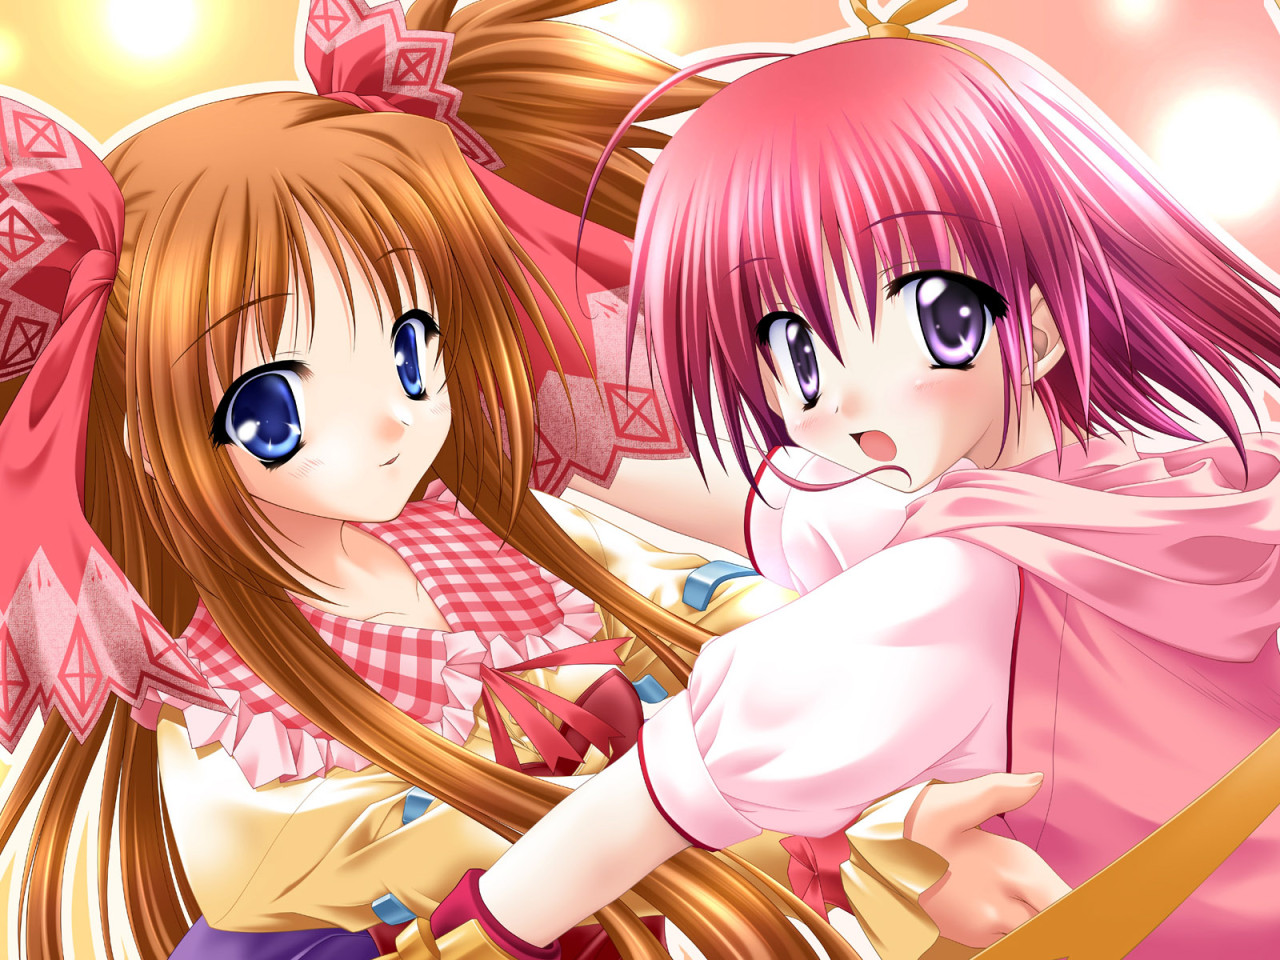 Beautiful anime girl wallpaper wallpapersafari - Anime pretty girl wallpaper ...